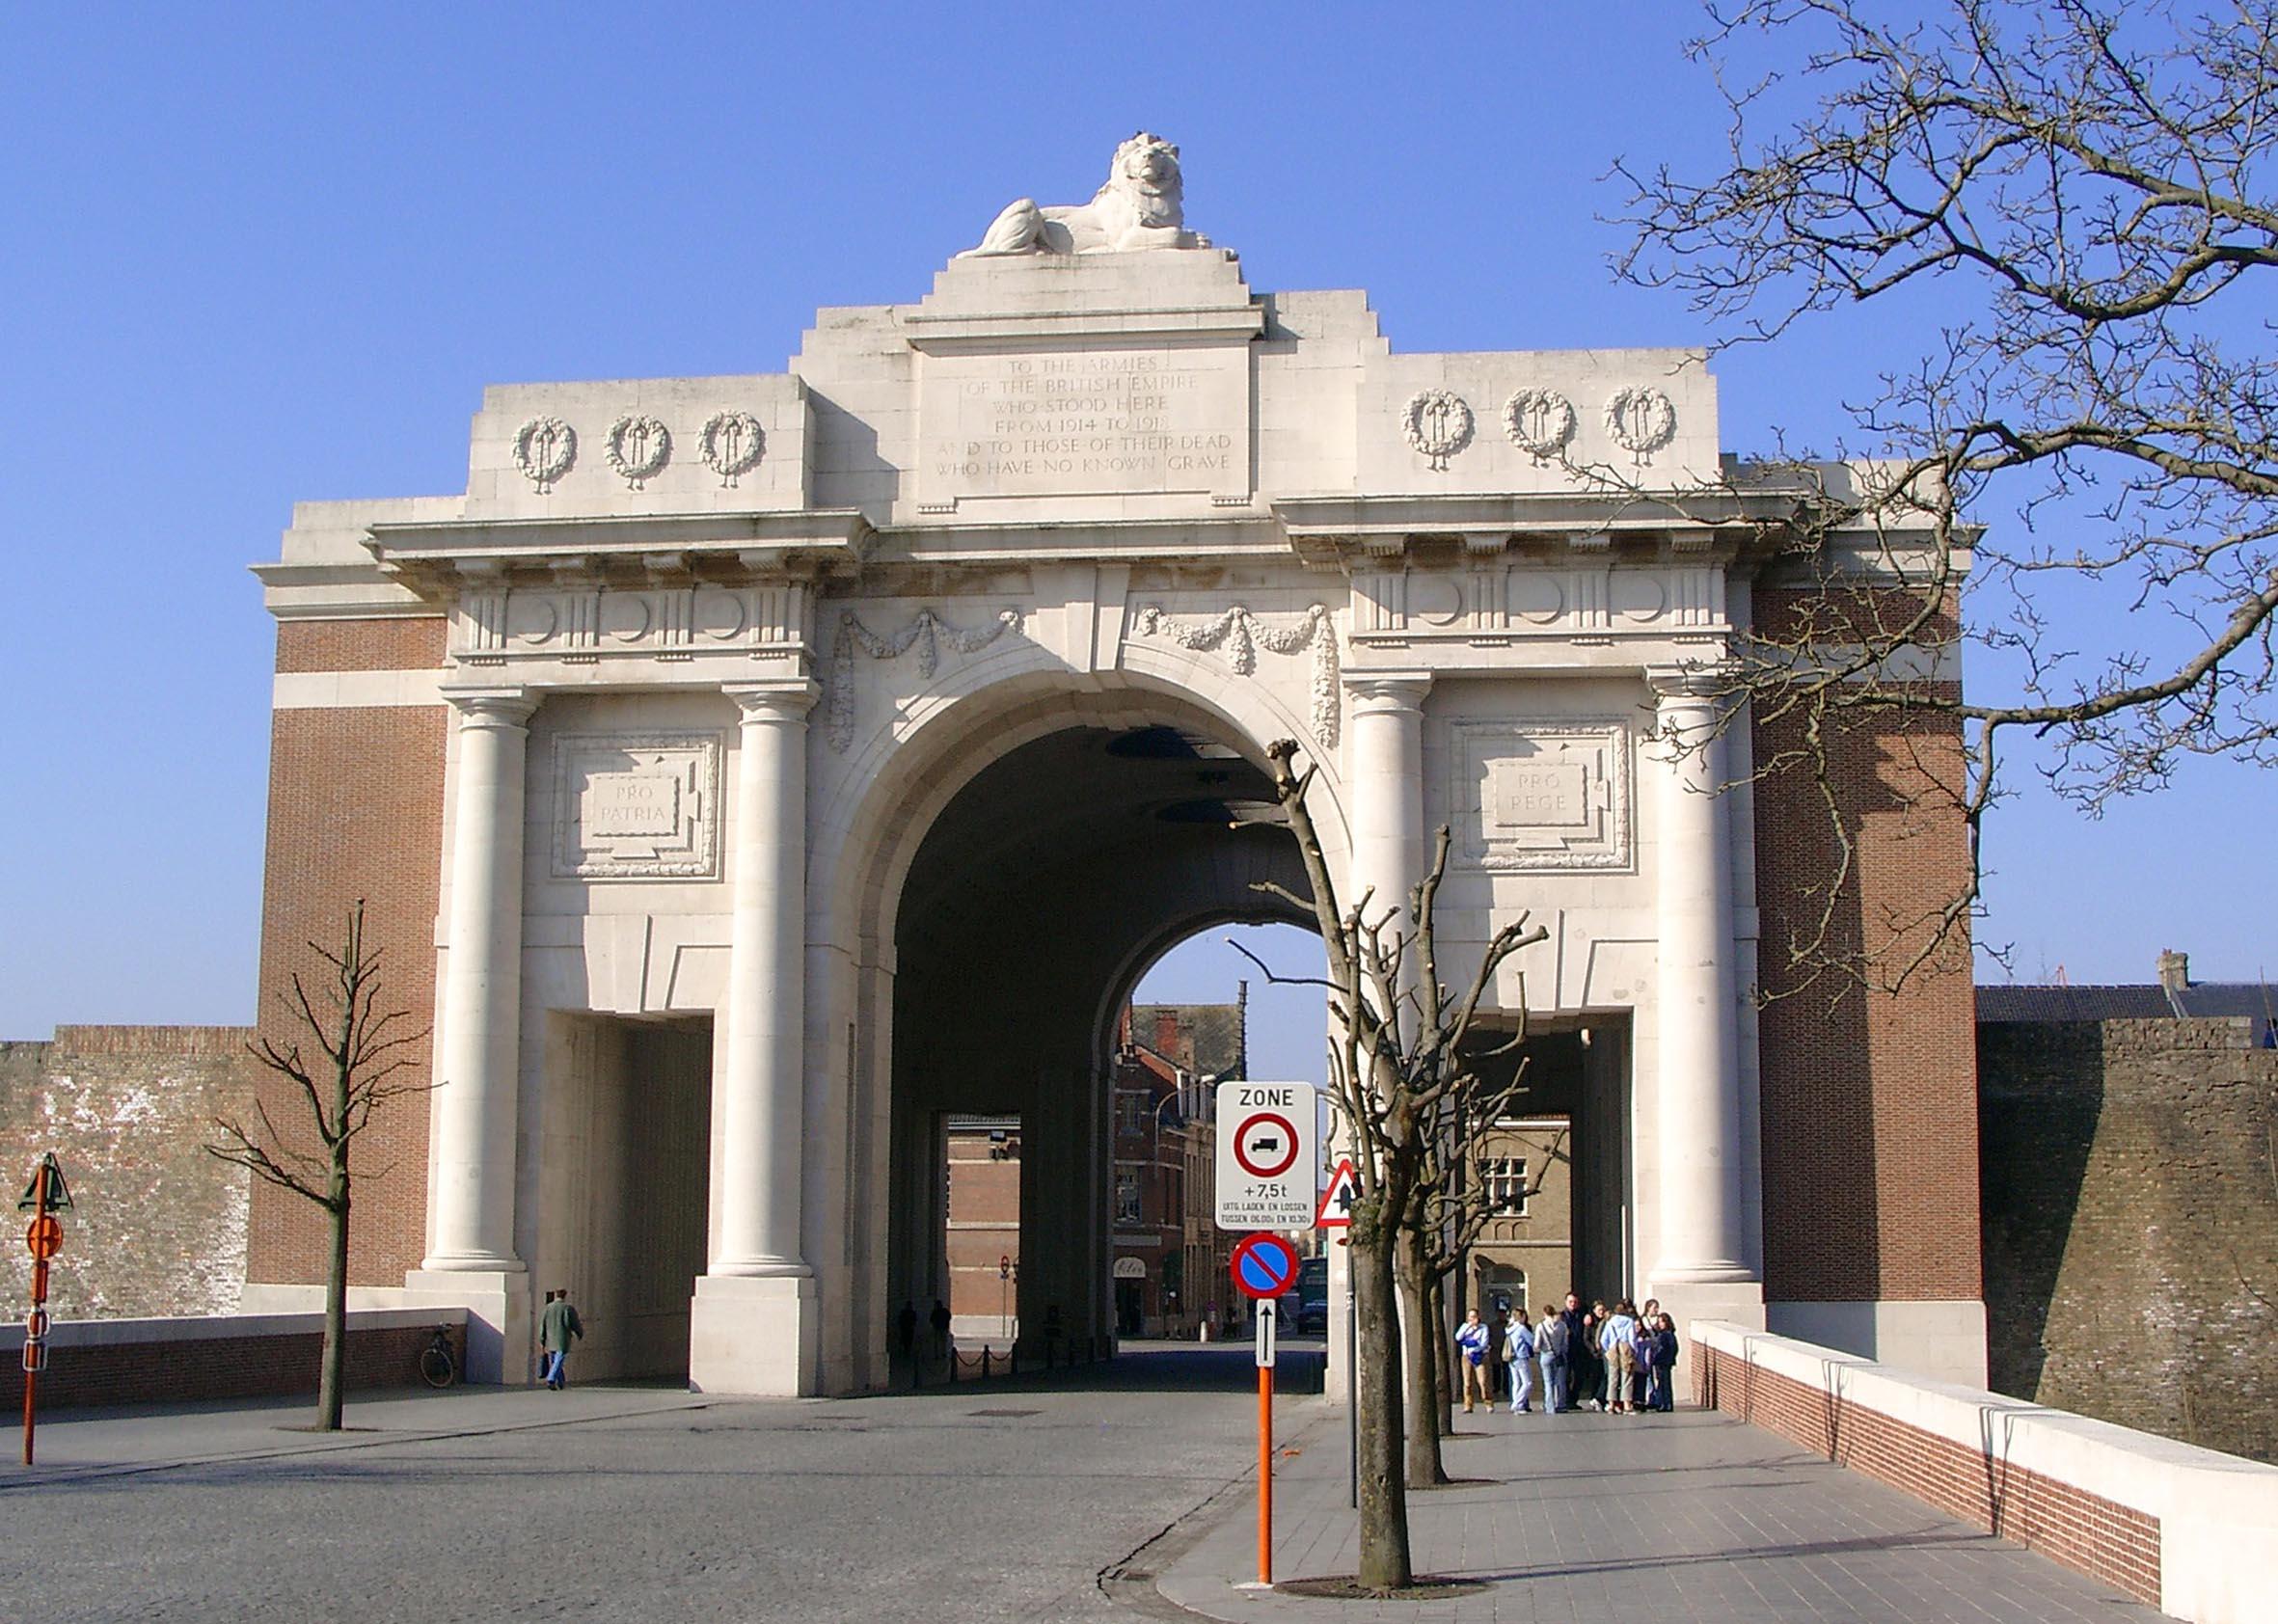 British Memorial to the Missing Menin Gate